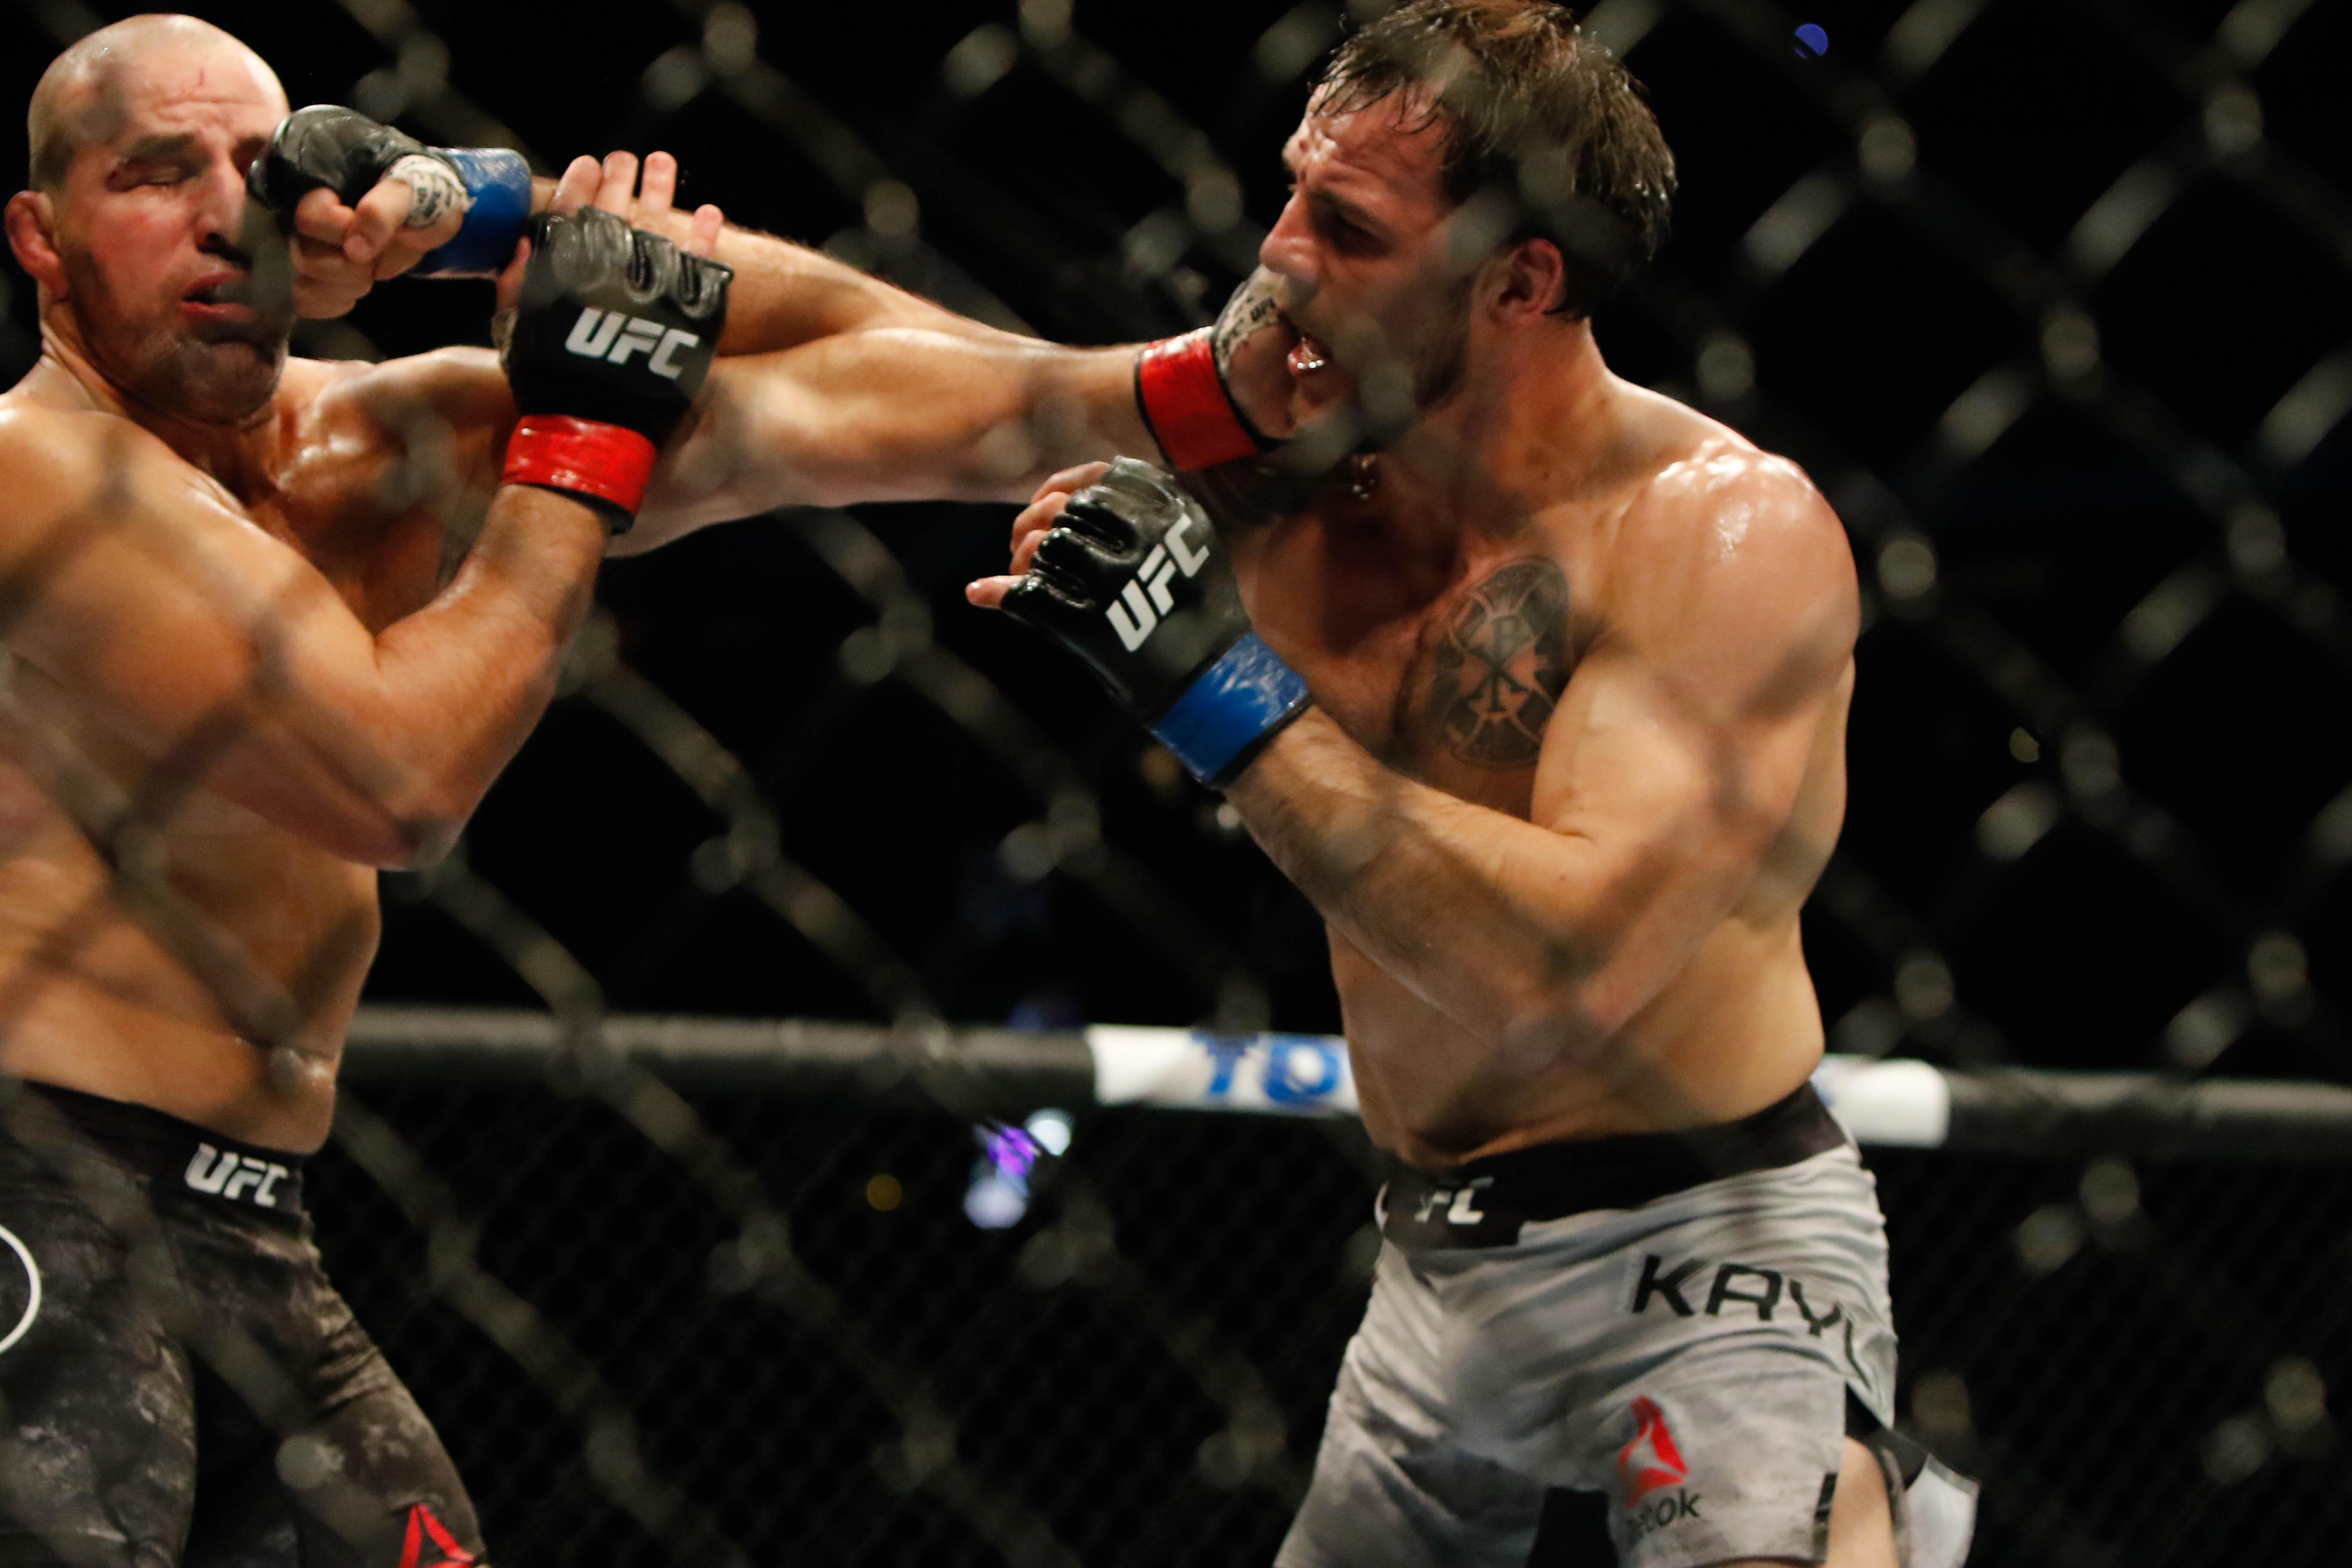 CT_bpp_UFC_teixeira_krylov-14092019-100.